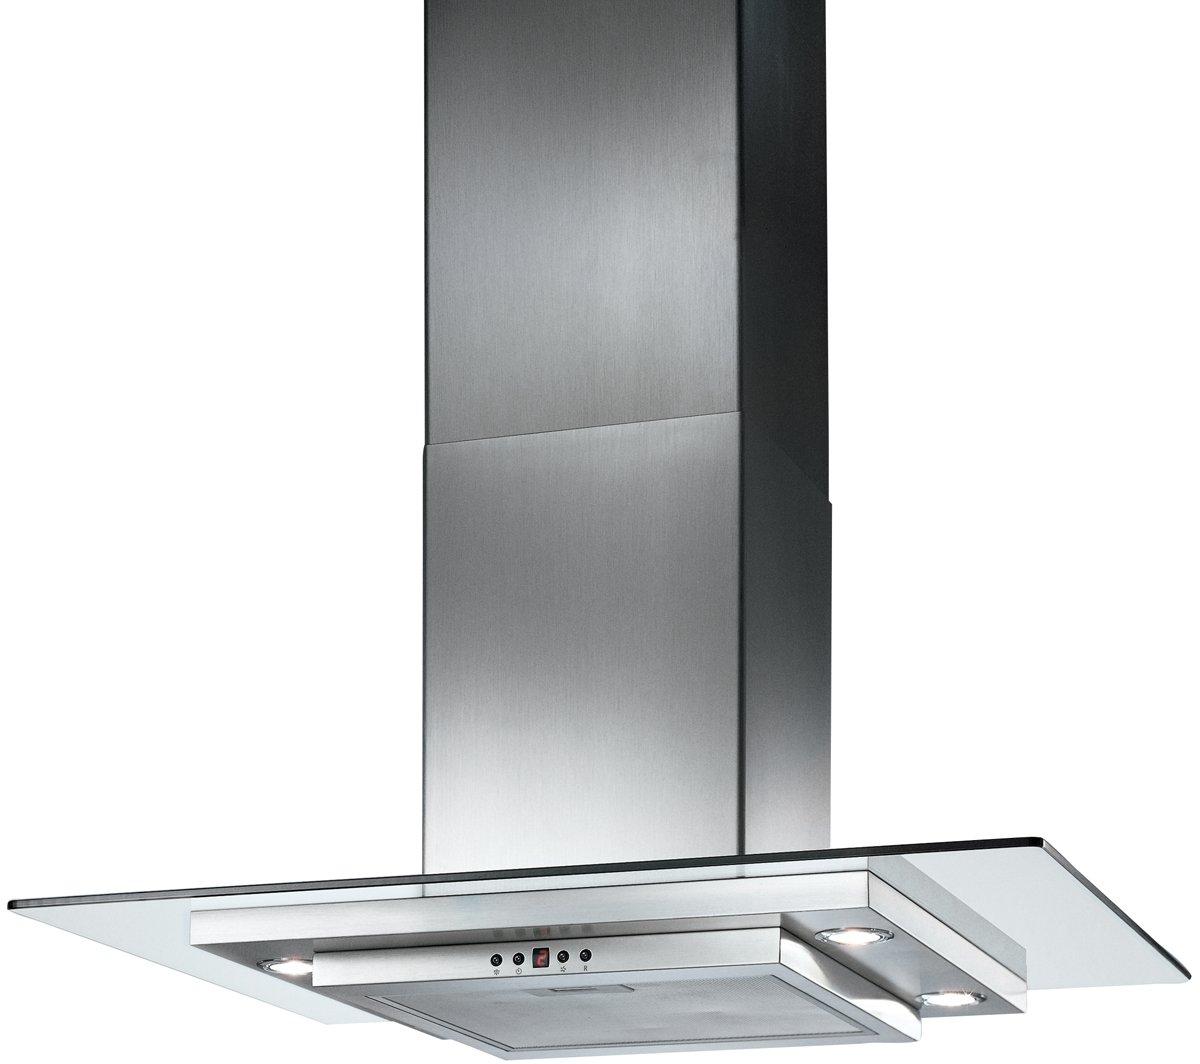 smeg is7599enc 2 90cm island rangehood appliances online rh appliancesonline com au smeg cooker hood troubleshooting Sears Range Hood Manual